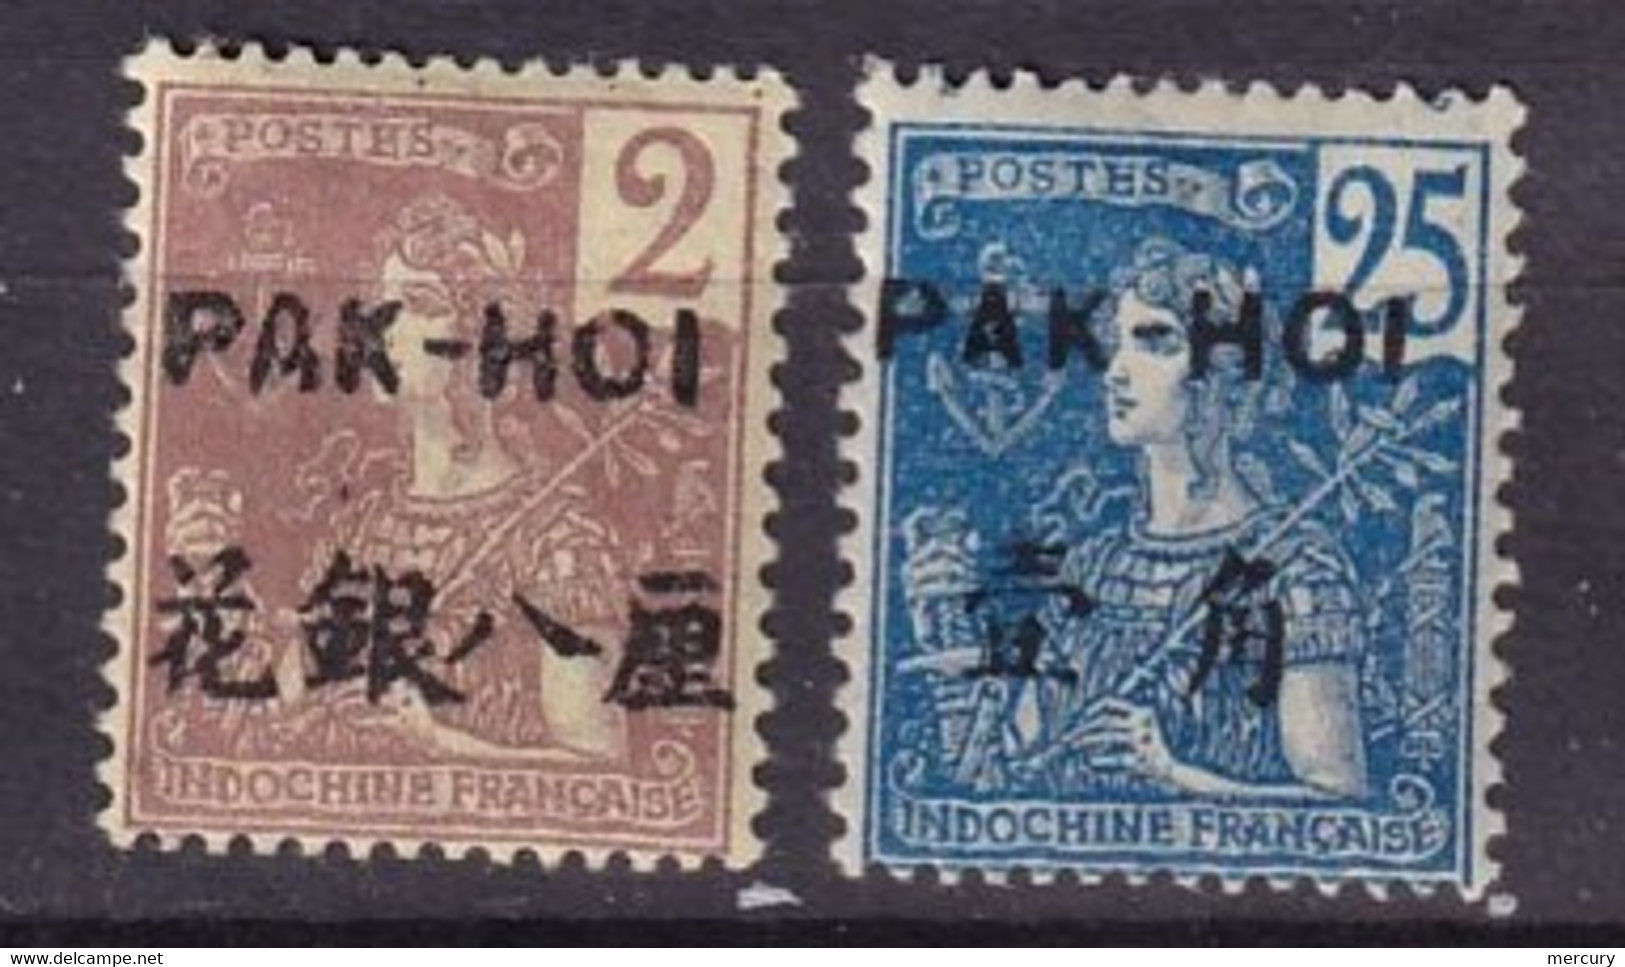 PAKHOI - 2 Grasset Neufs - Unused Stamps